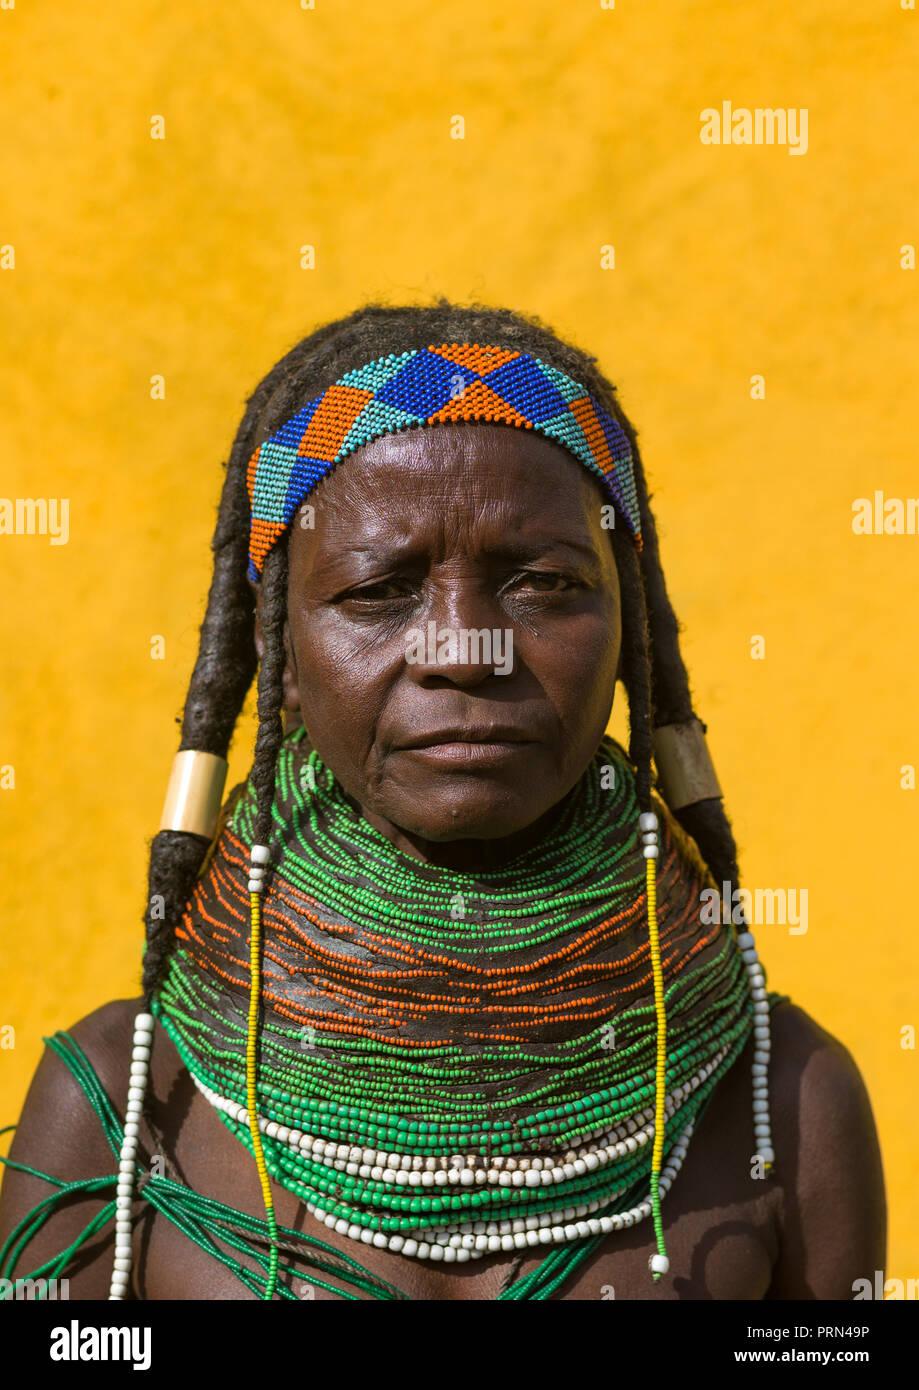 Portrait of a Mungambue tribe woman portrait, Huila Province, Chibia, Angola Stock Photo